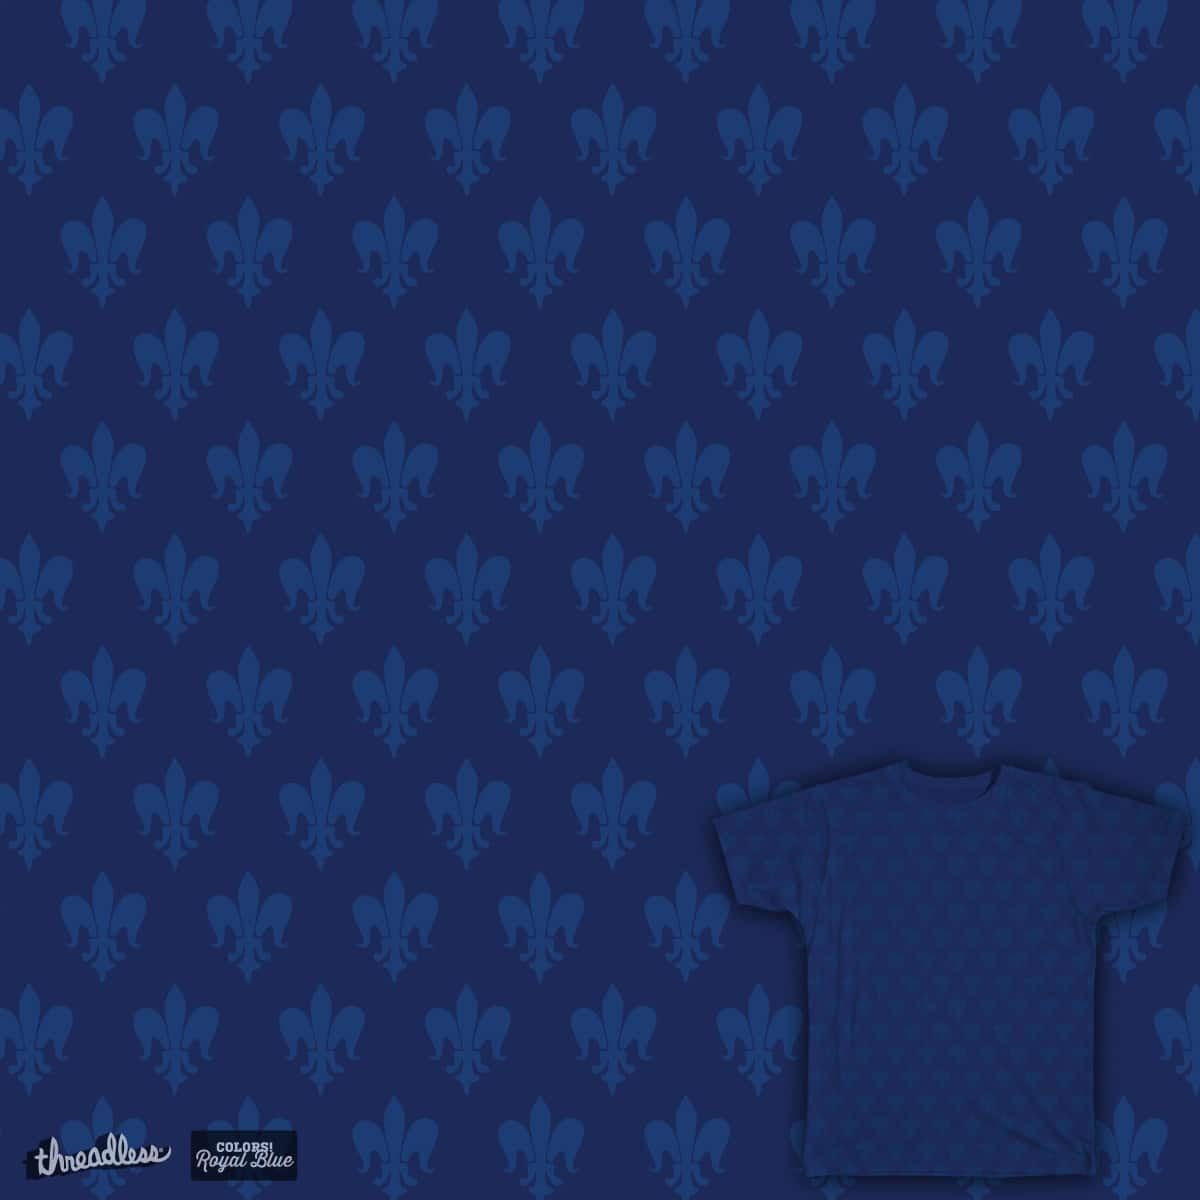 Fleur-de-lis by BakusPT on Threadless